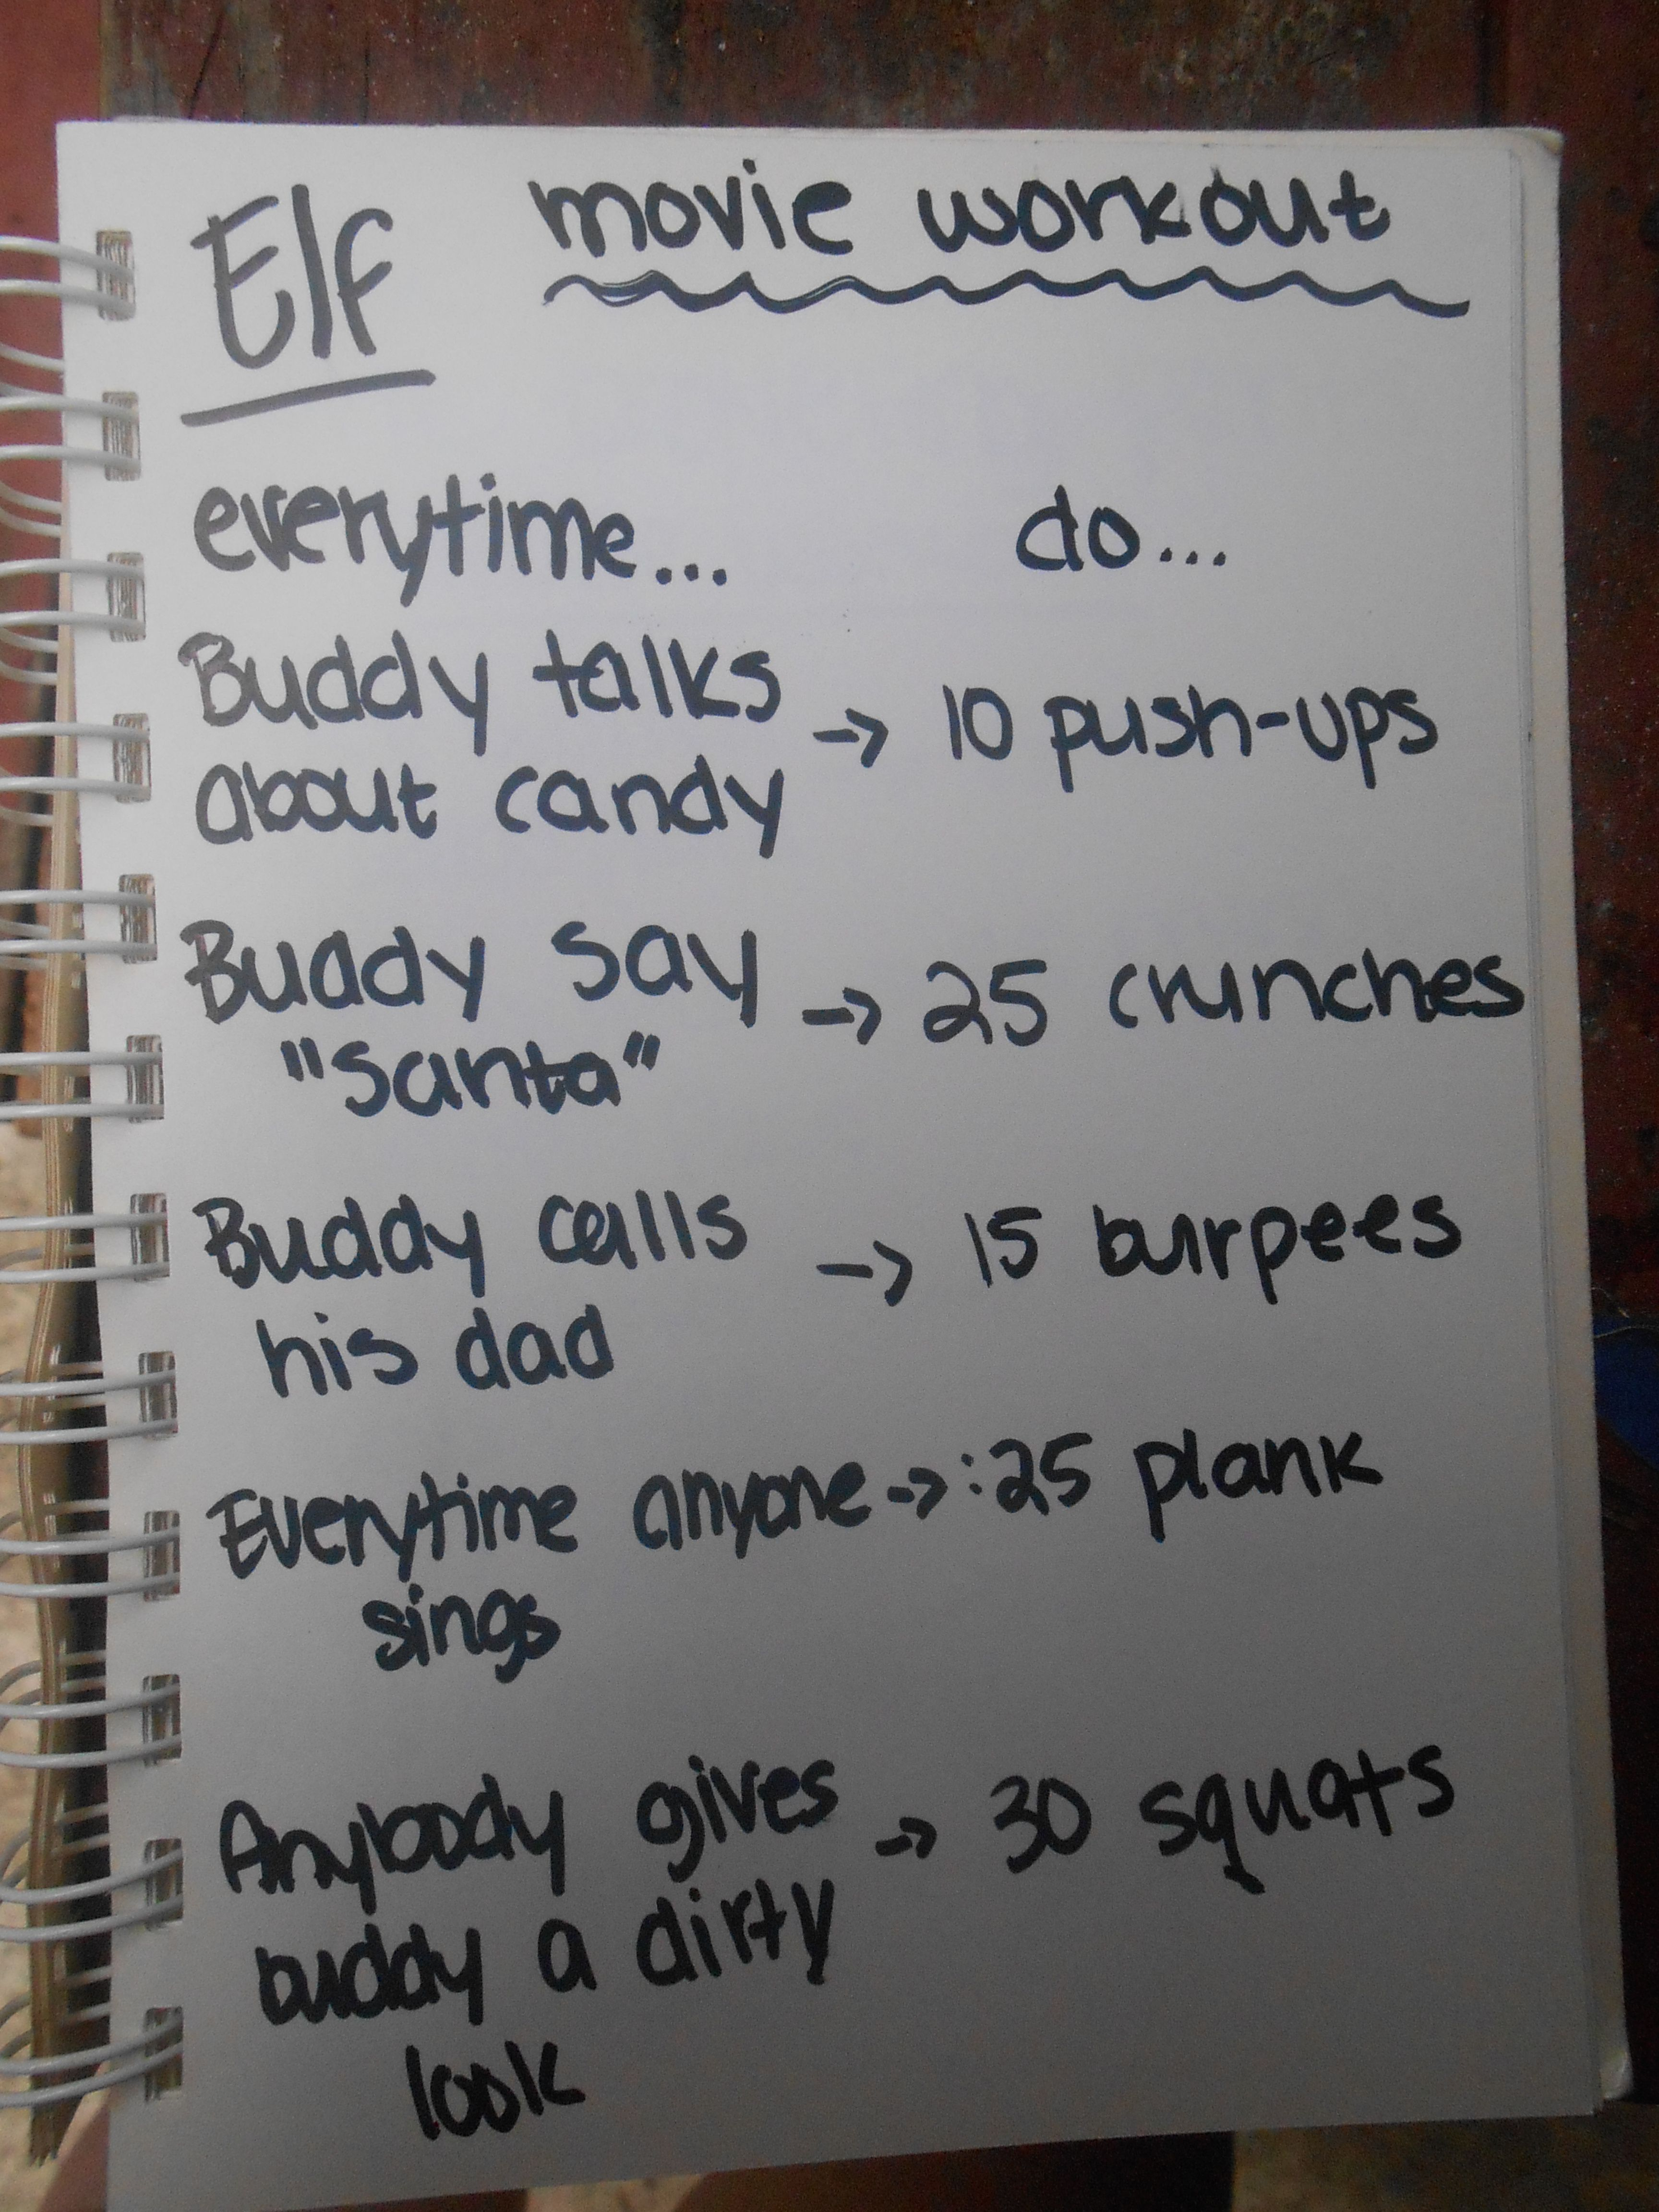 Deer Antler Spray Fun workouts, Movie workouts, Tv show